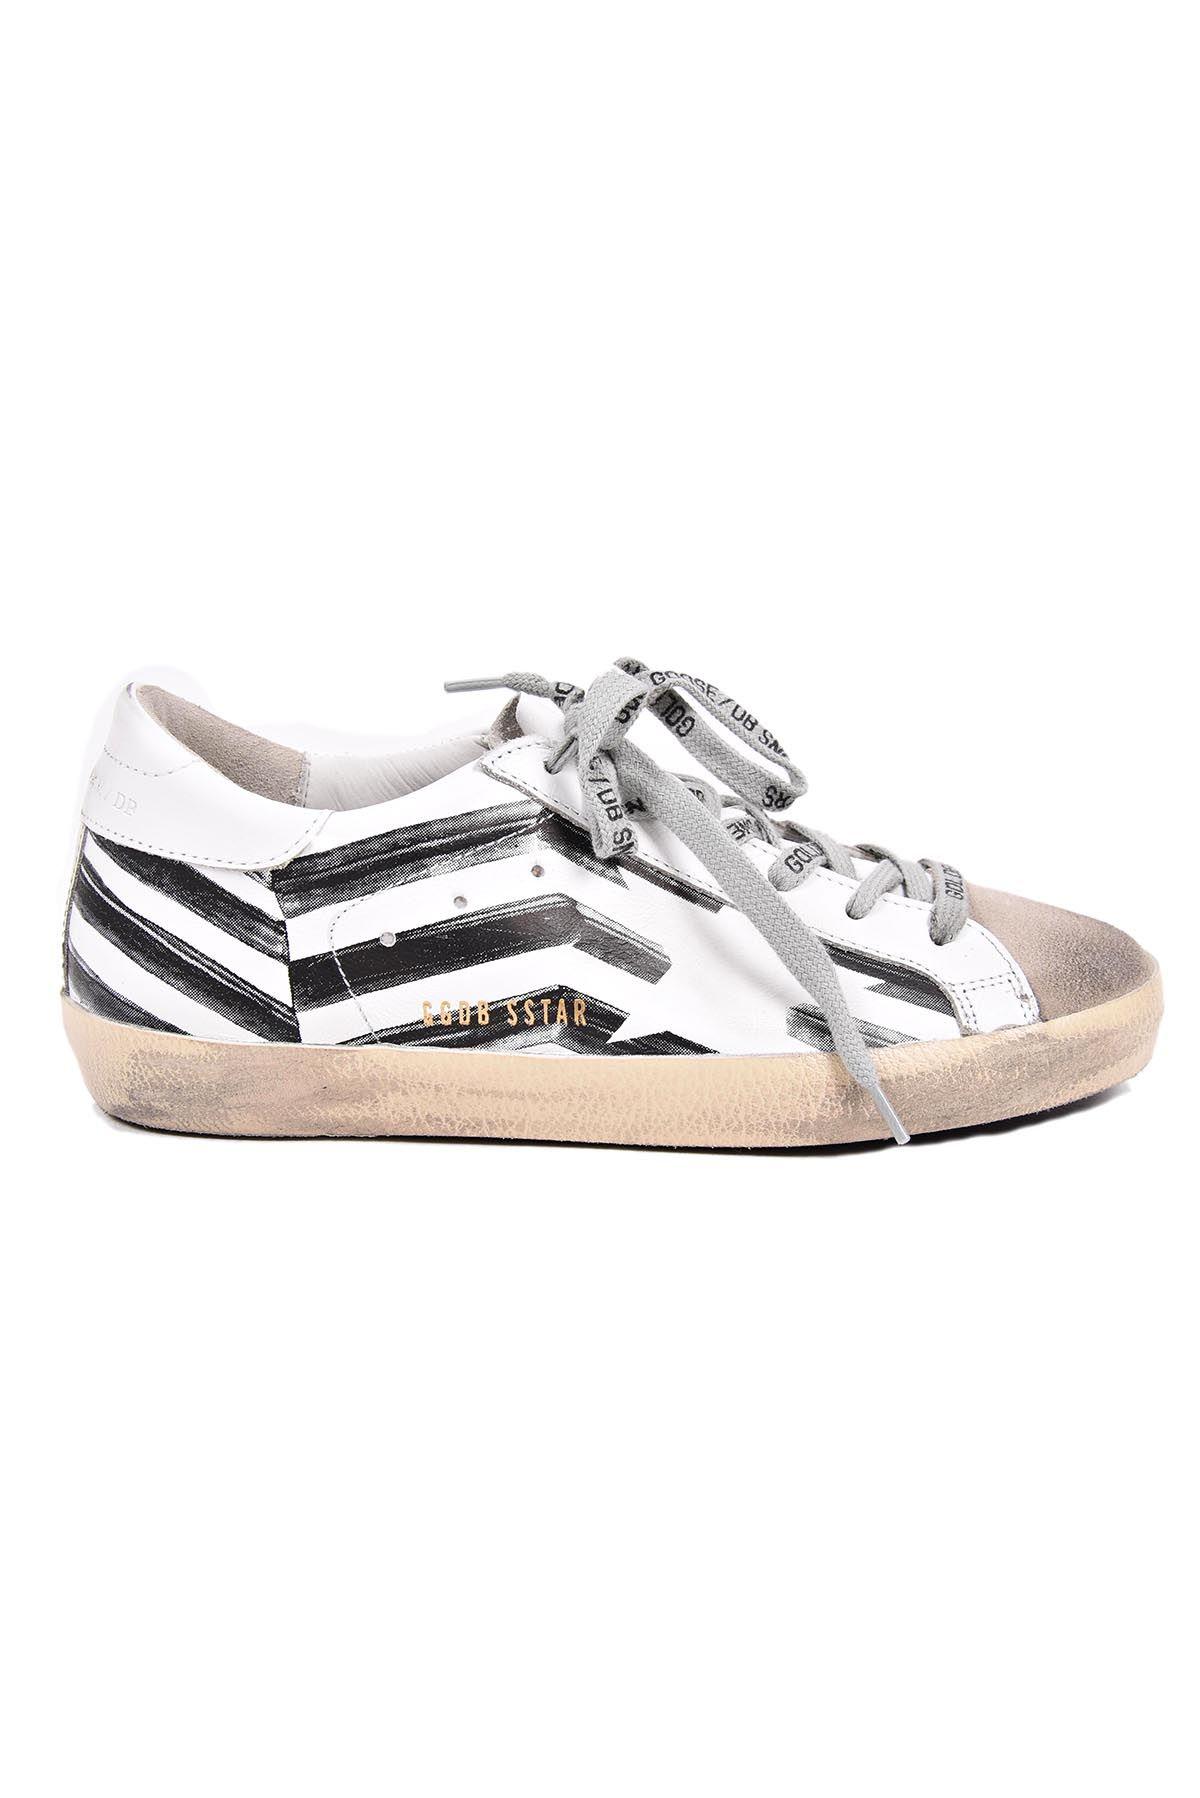 golden goose golden goose superstar white flag sneakers multicolour women 39 s sneakers italist. Black Bedroom Furniture Sets. Home Design Ideas